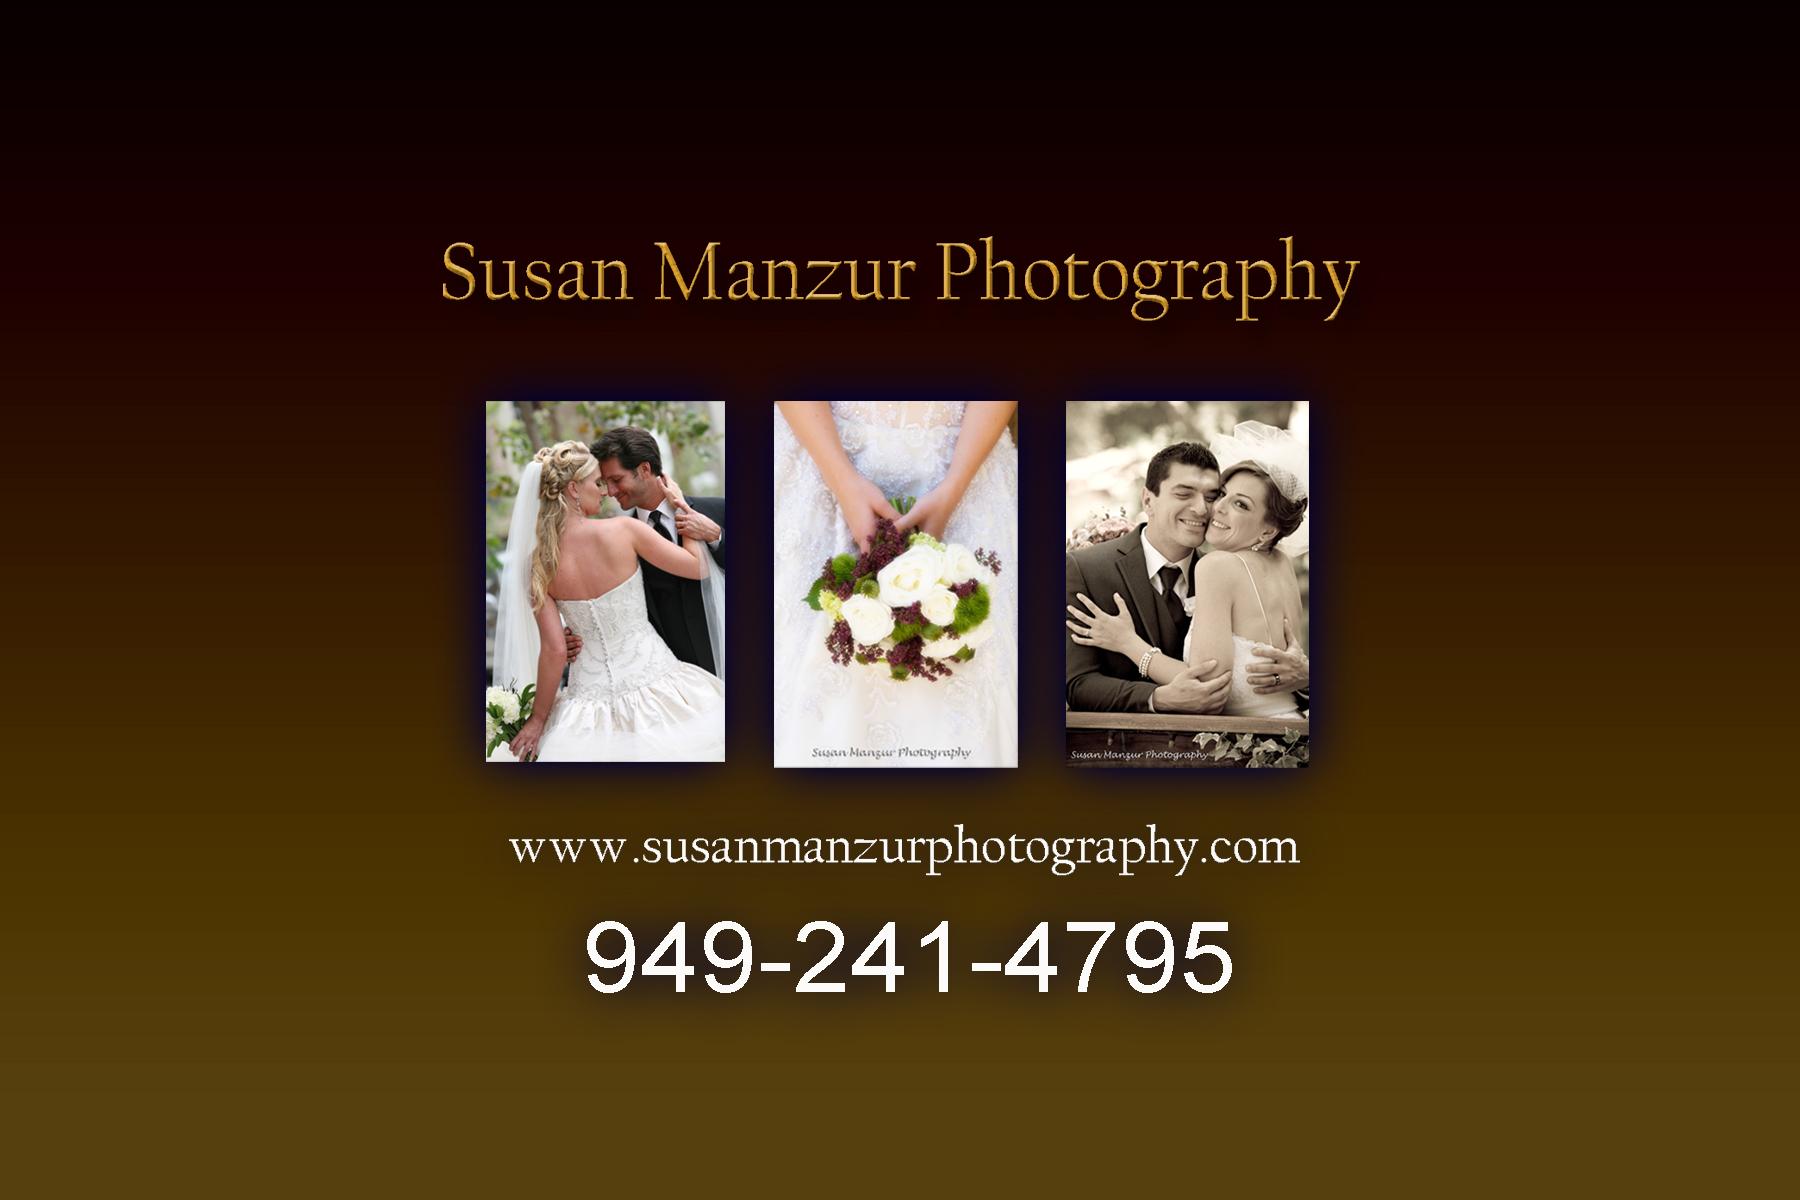 Susan Manzur Photography